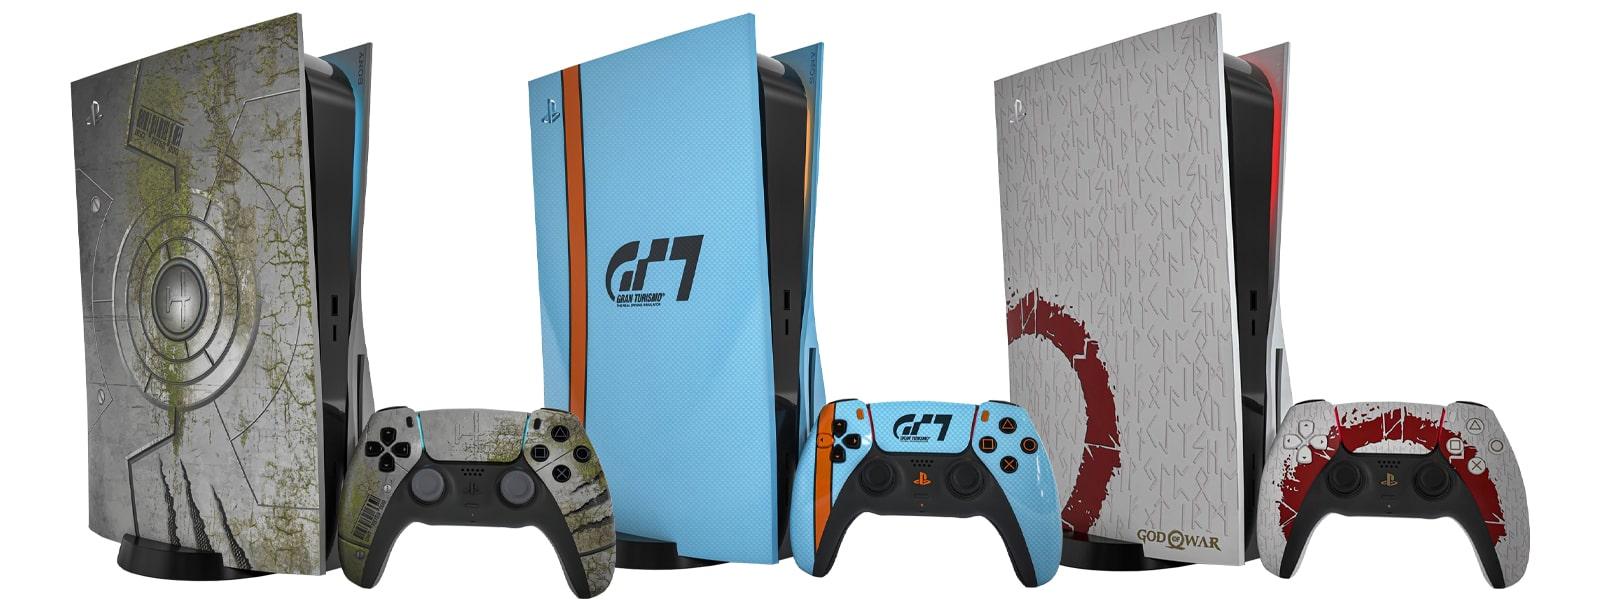 Rendu PS5 en édition limitée - Horizon Forbidden West - Gran Turismo 7 - God Of War